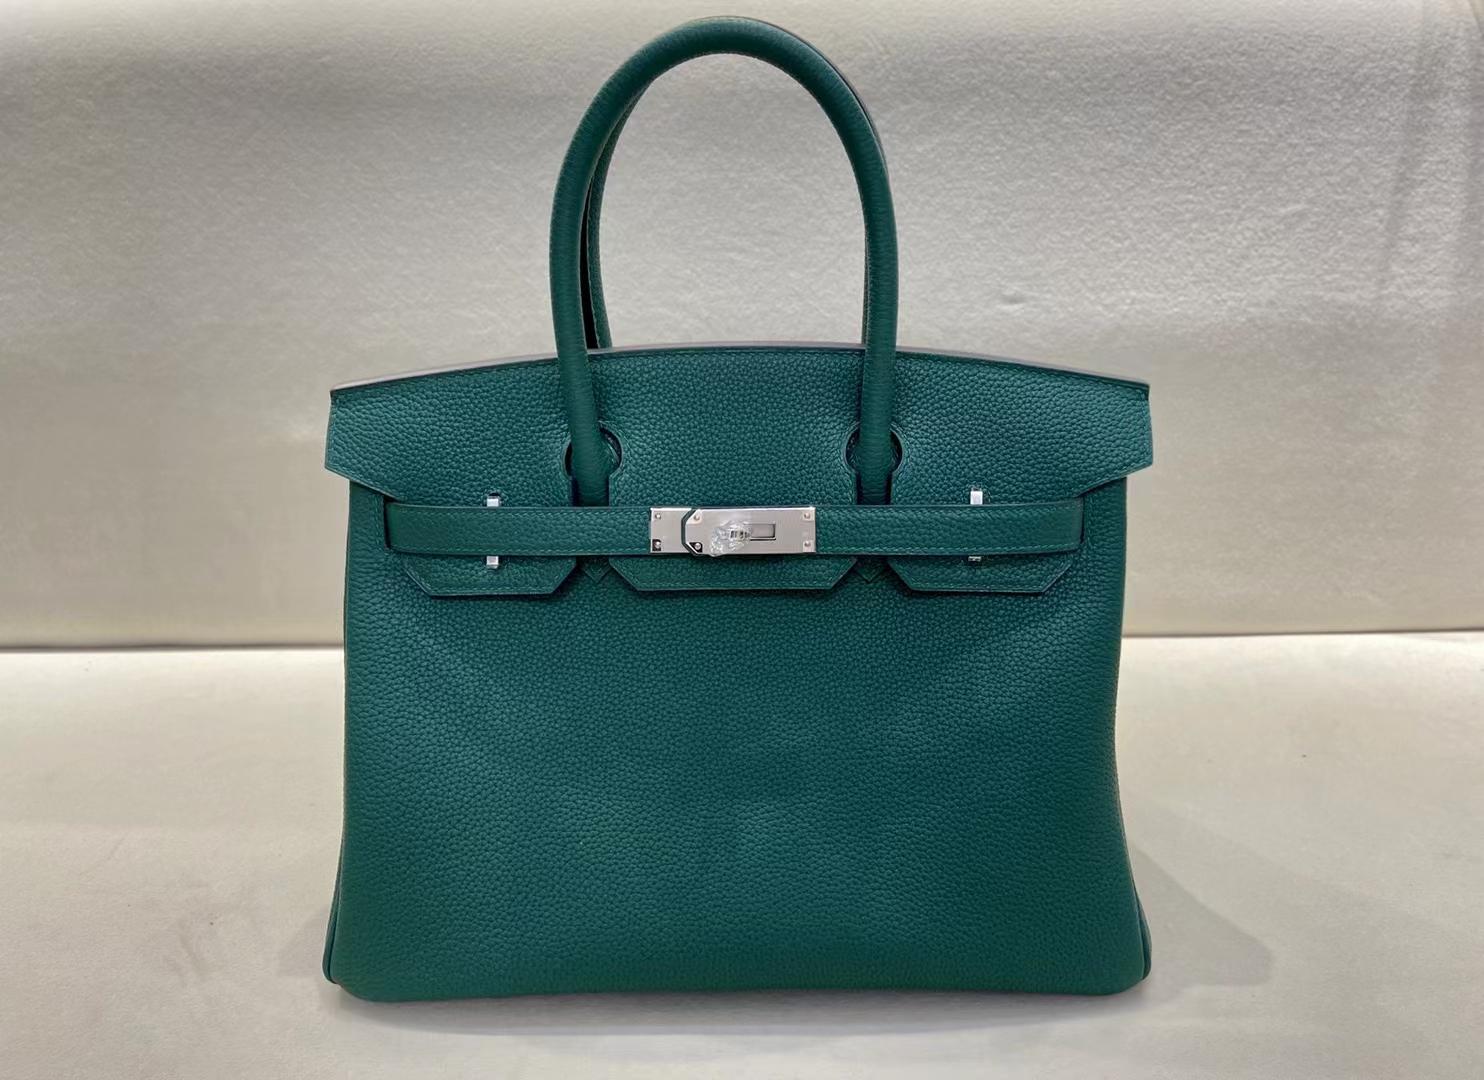 Hermès(爱马仕)birkin 铂金包 法国togo Z6 孔雀绿 Malachite 银扣 30cm 顶级纯手工